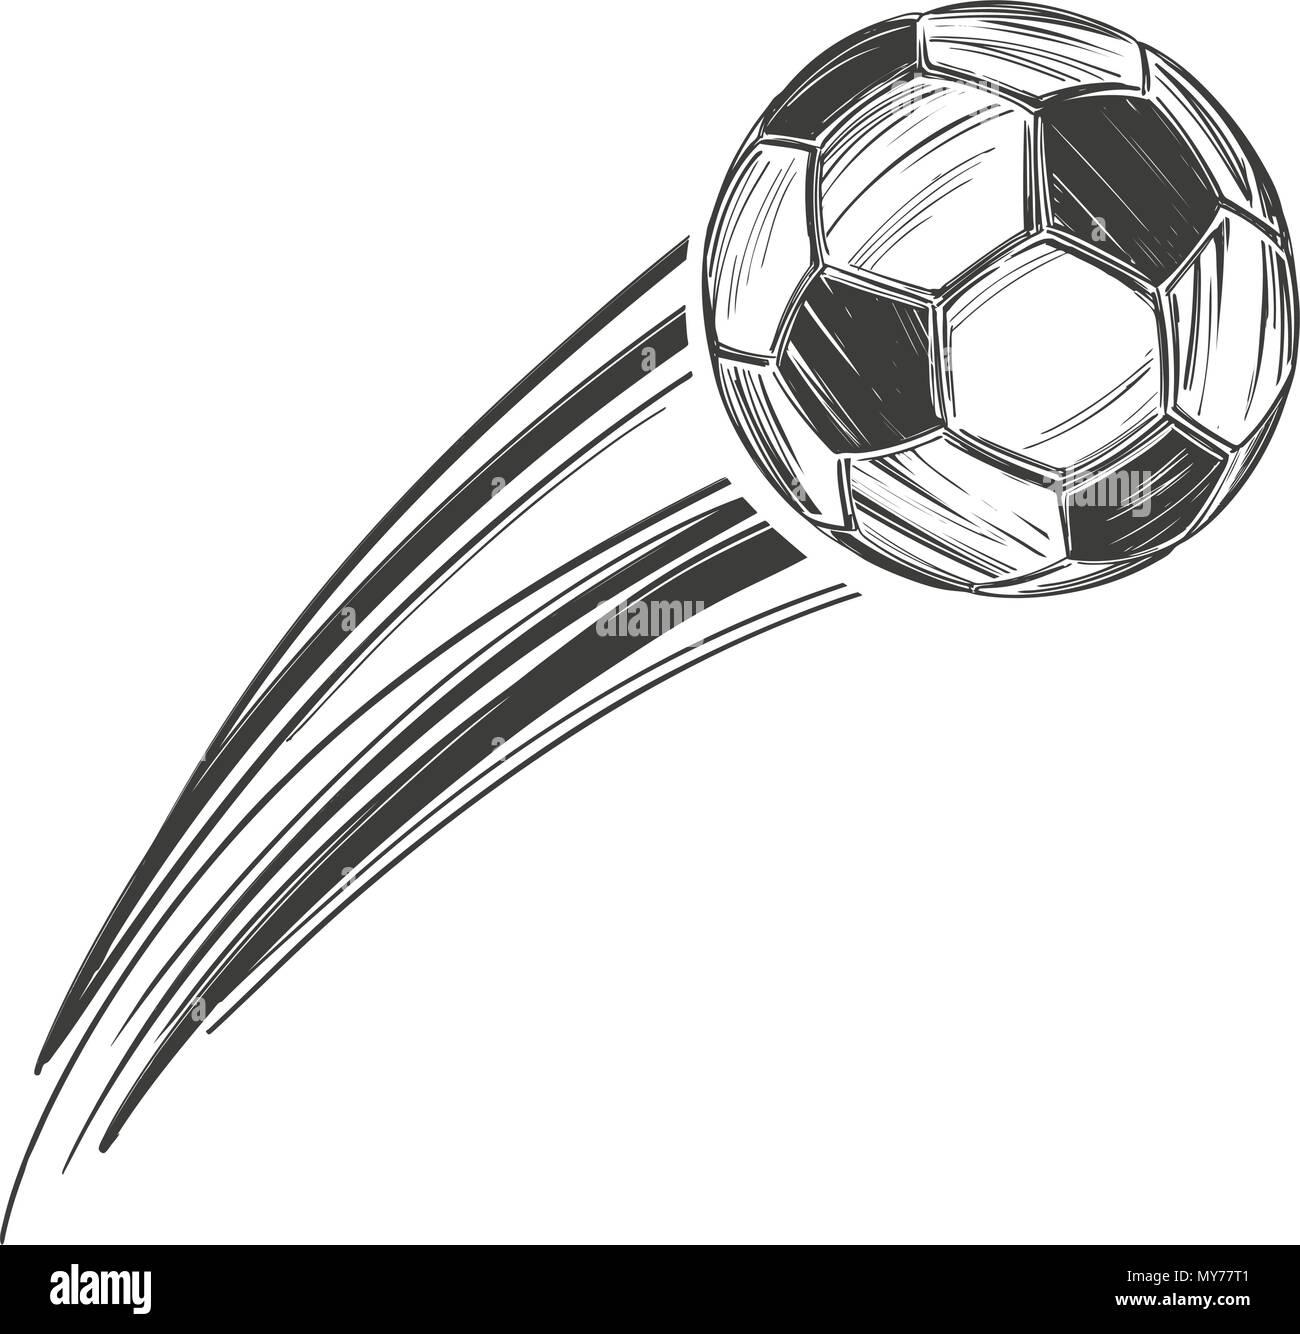 Fussball Fussball Sport Spiel Kalligraphische Texte Emblem